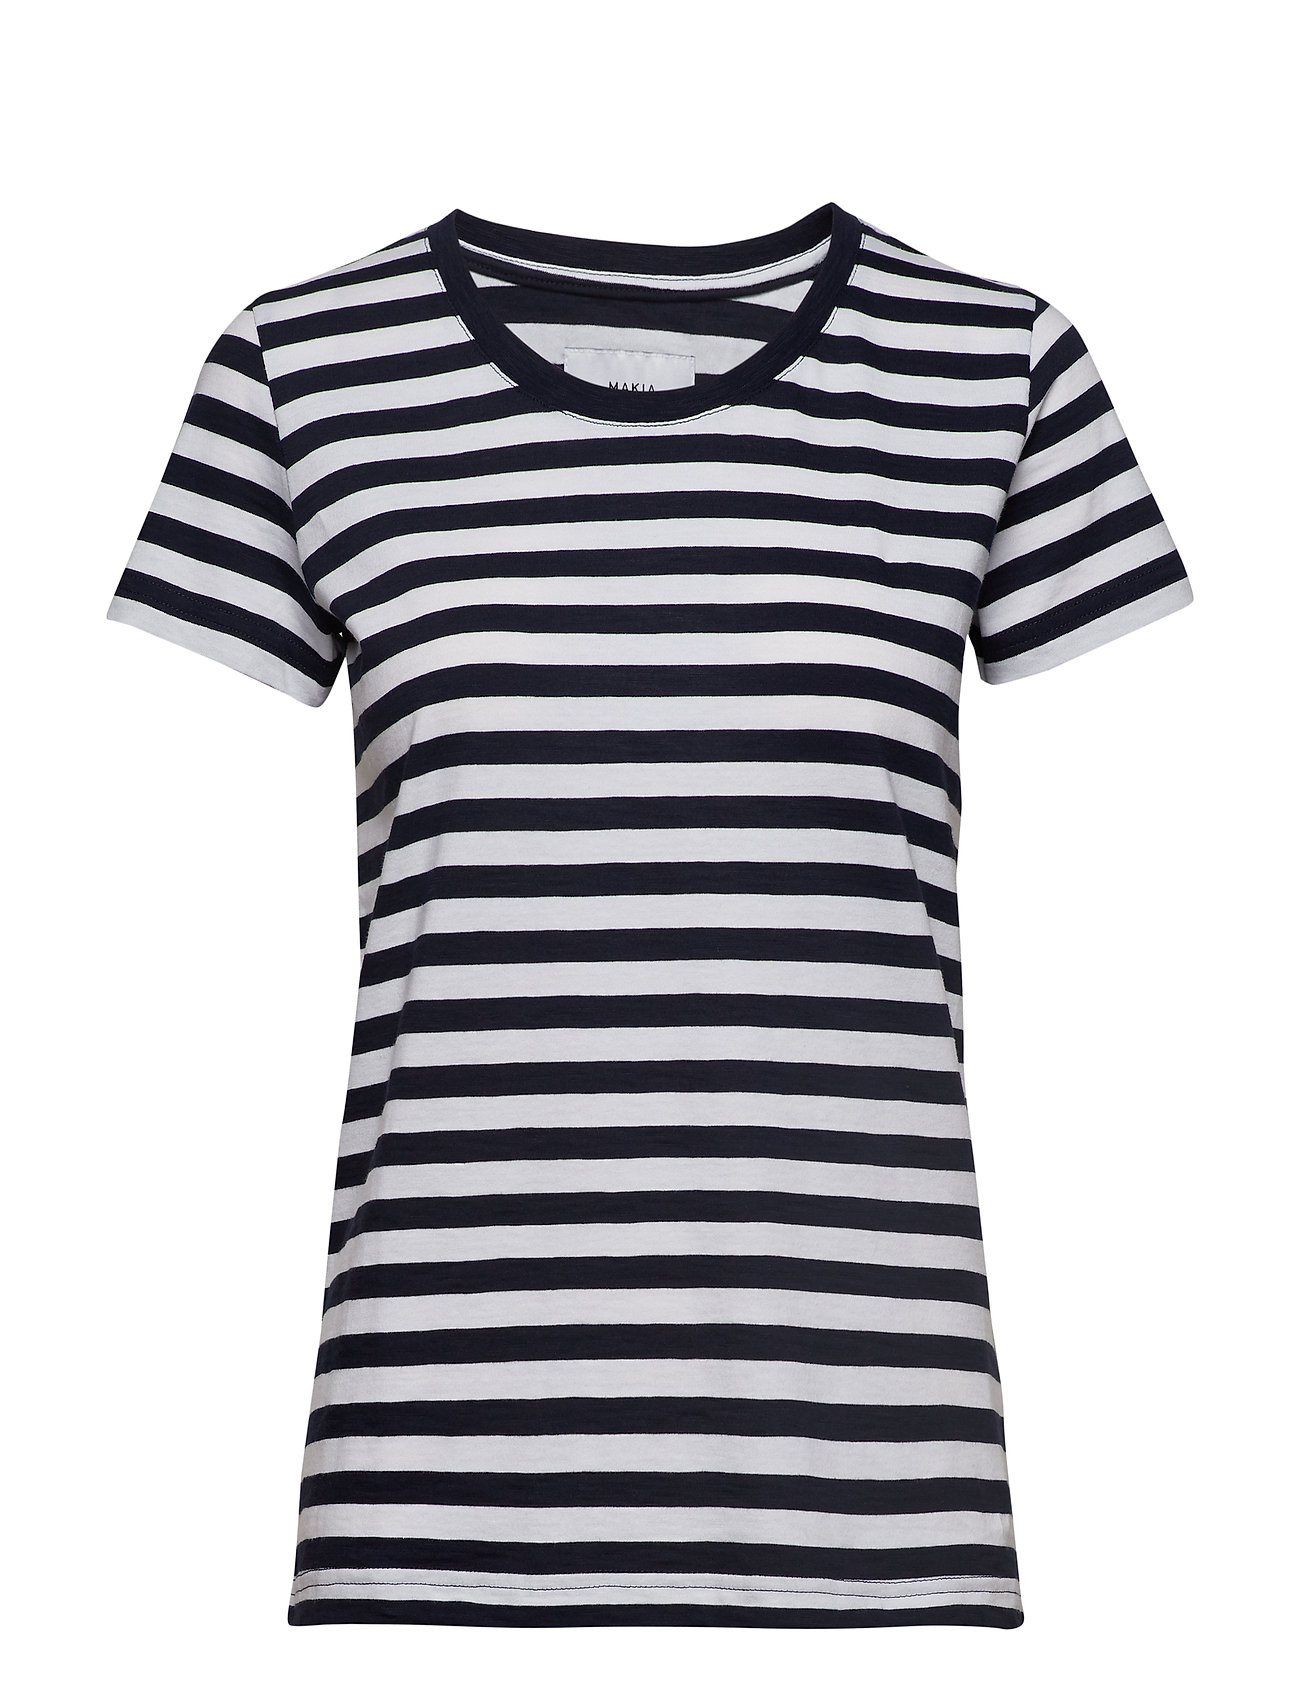 Makia Verkstad T-Shirt - NAVY-WHITE